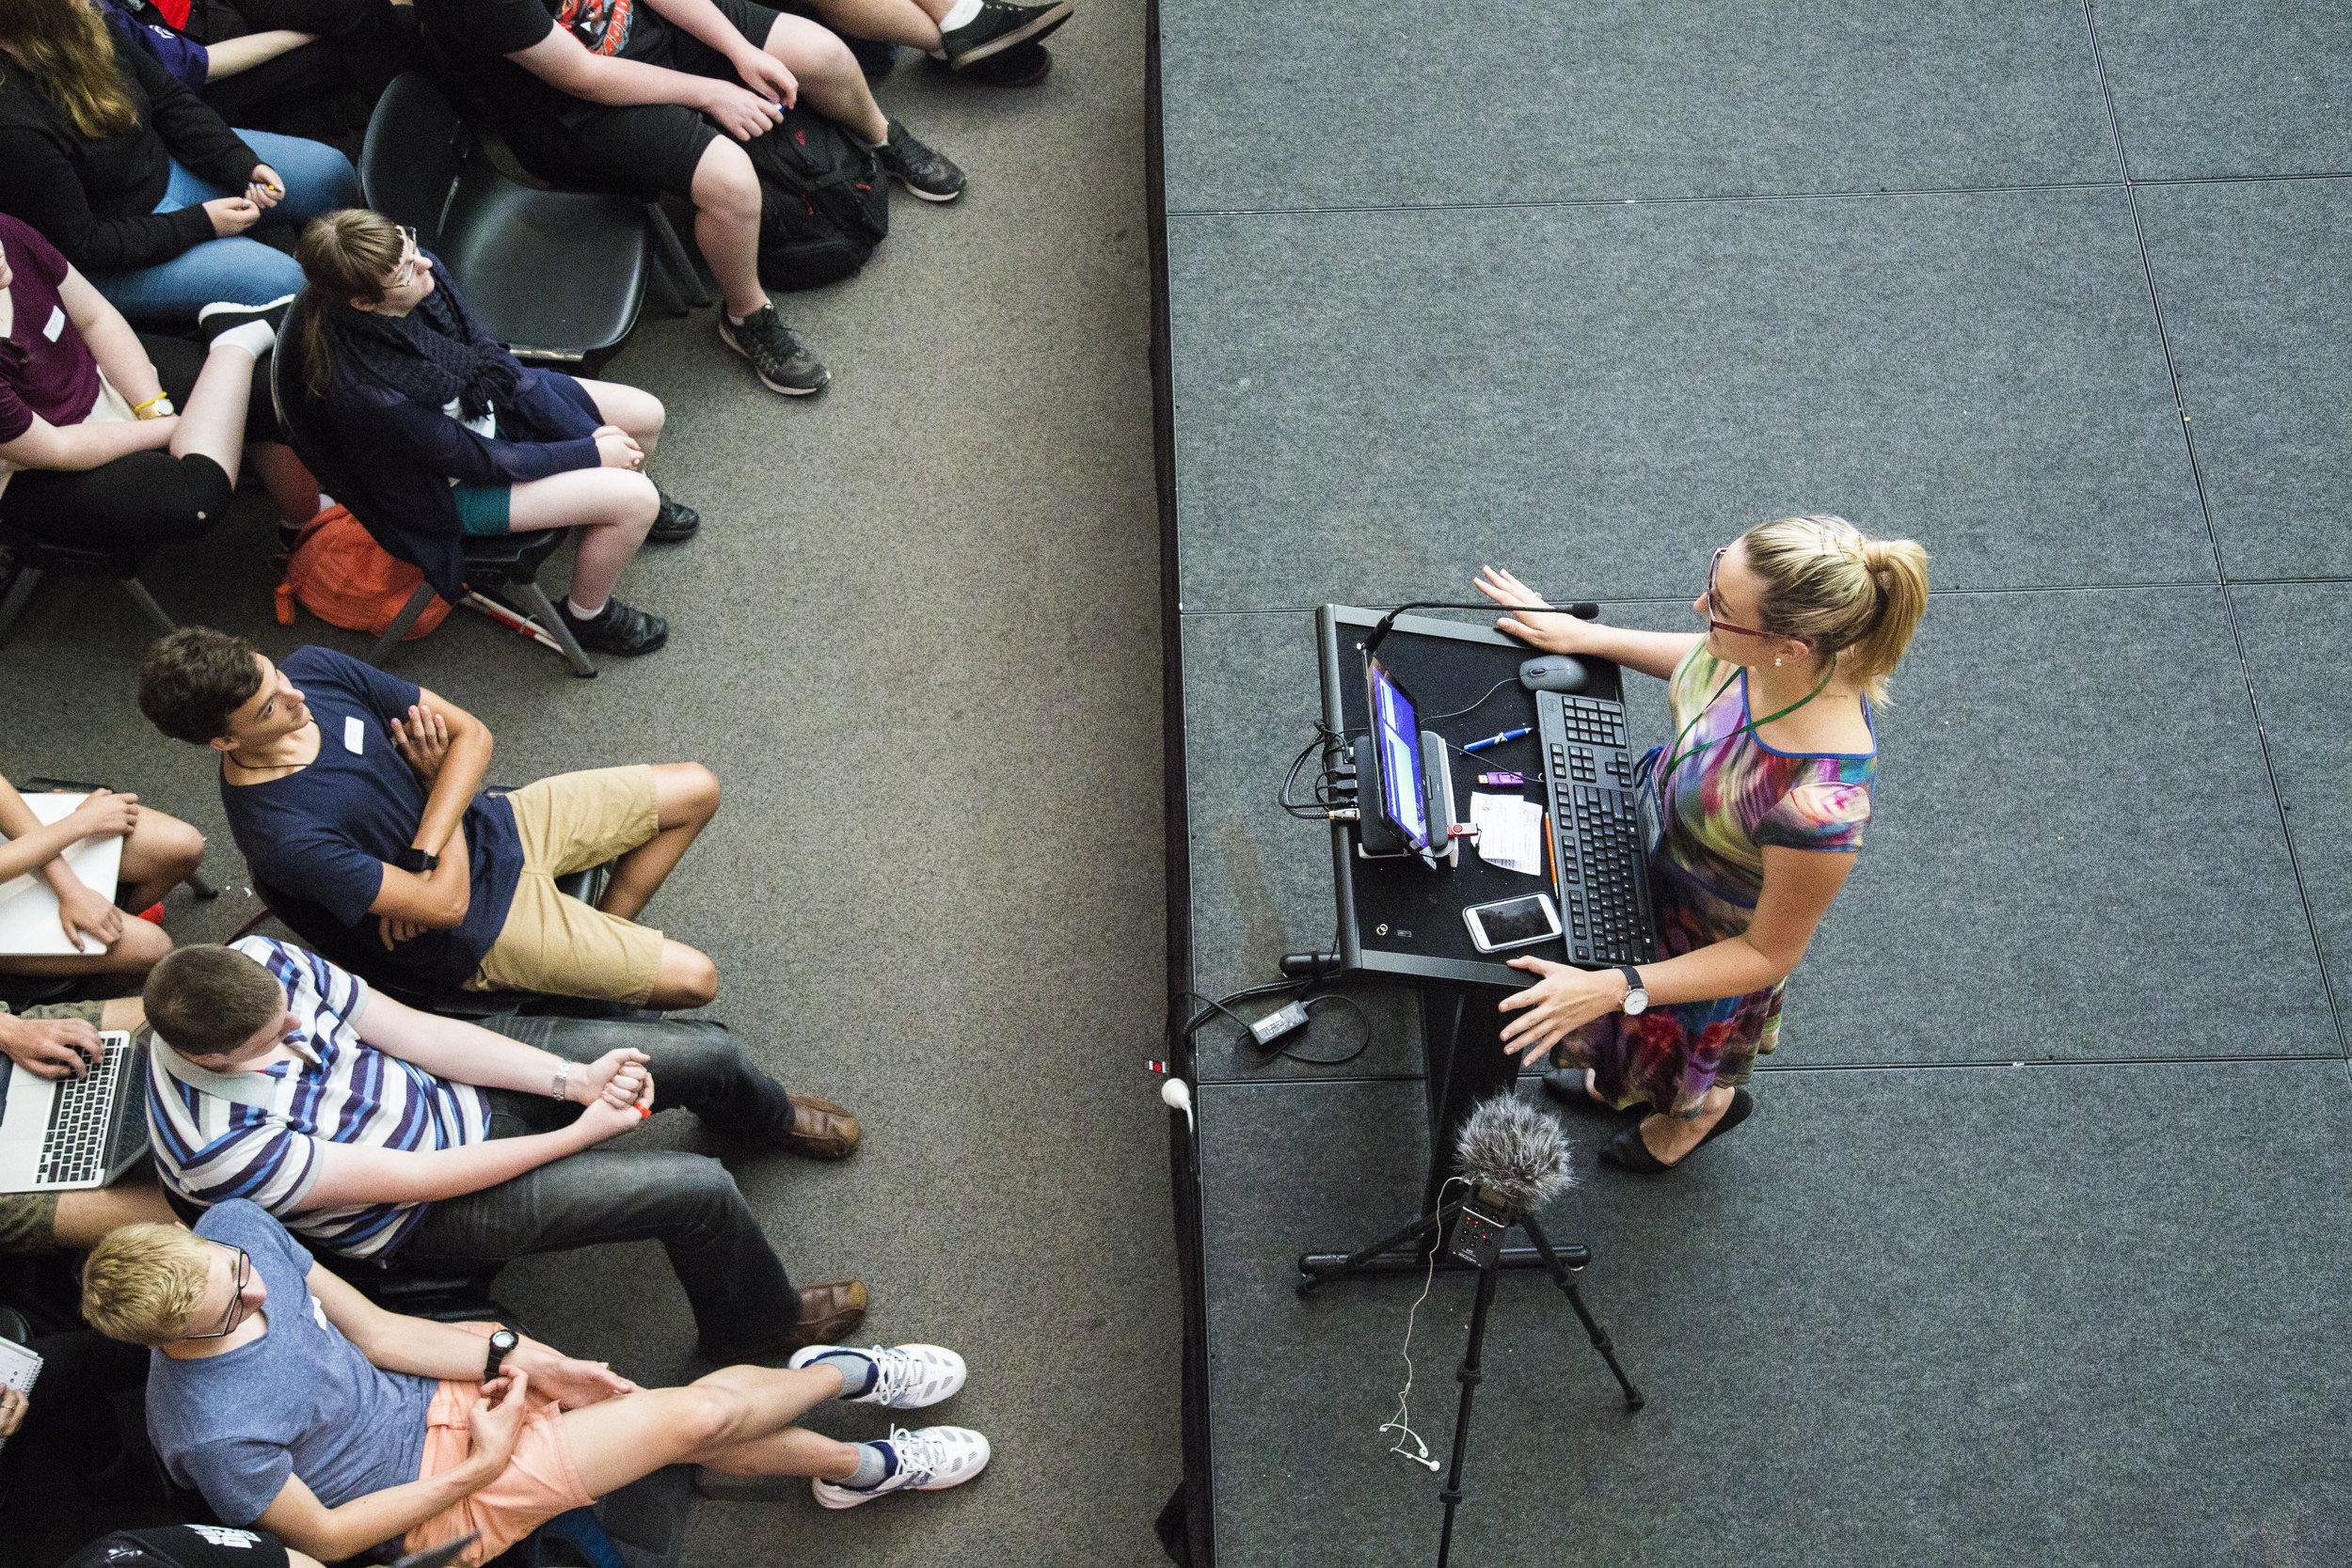 Helen delivering an educational keynote